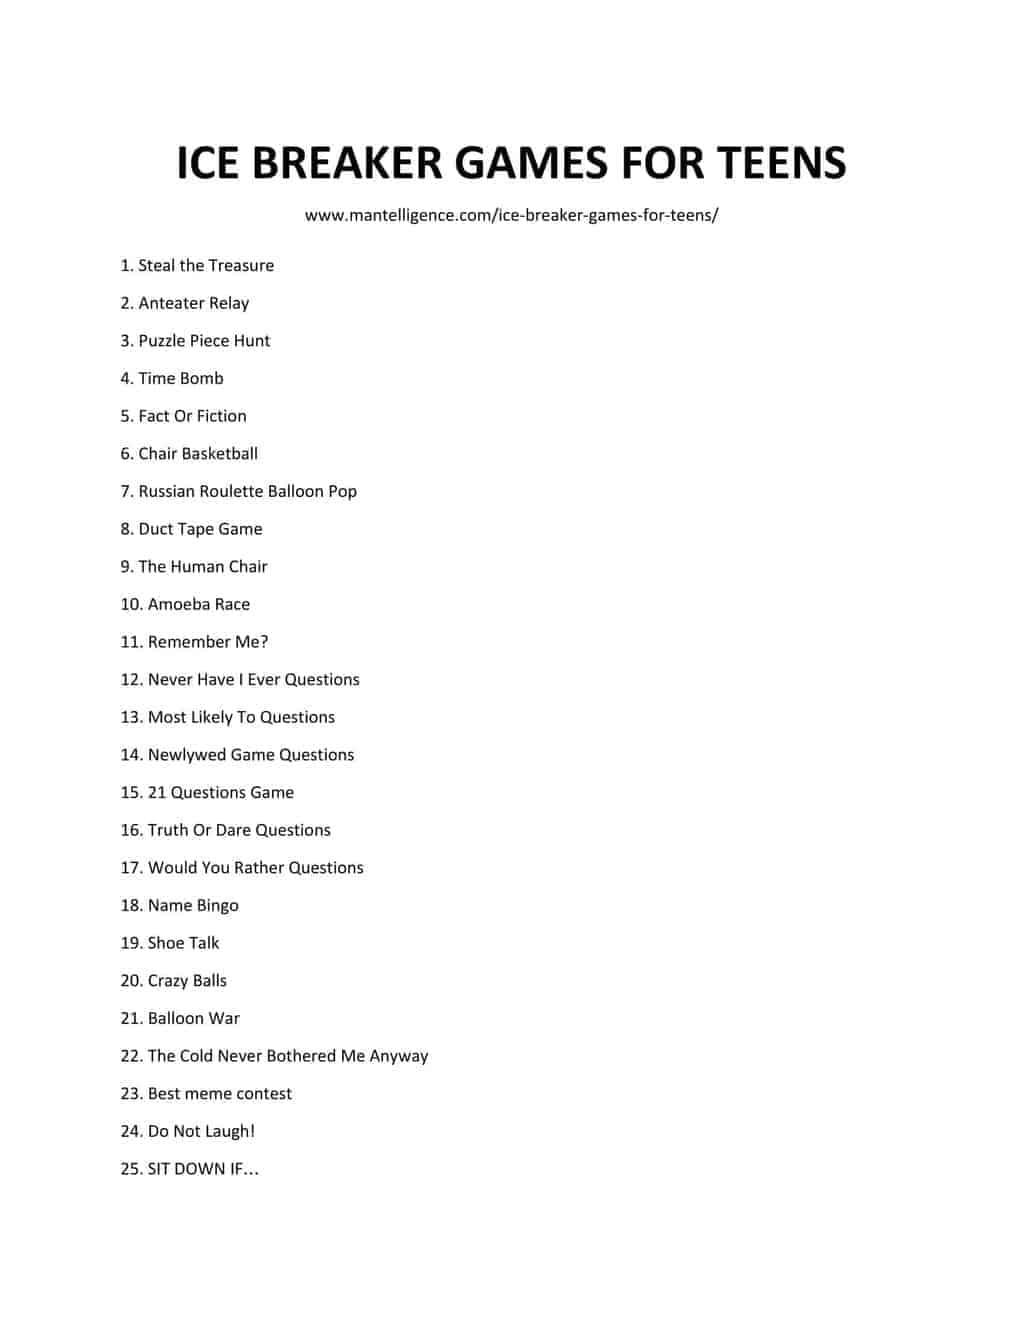 List of ICE BREAKER GAMES FOR TEENS 3